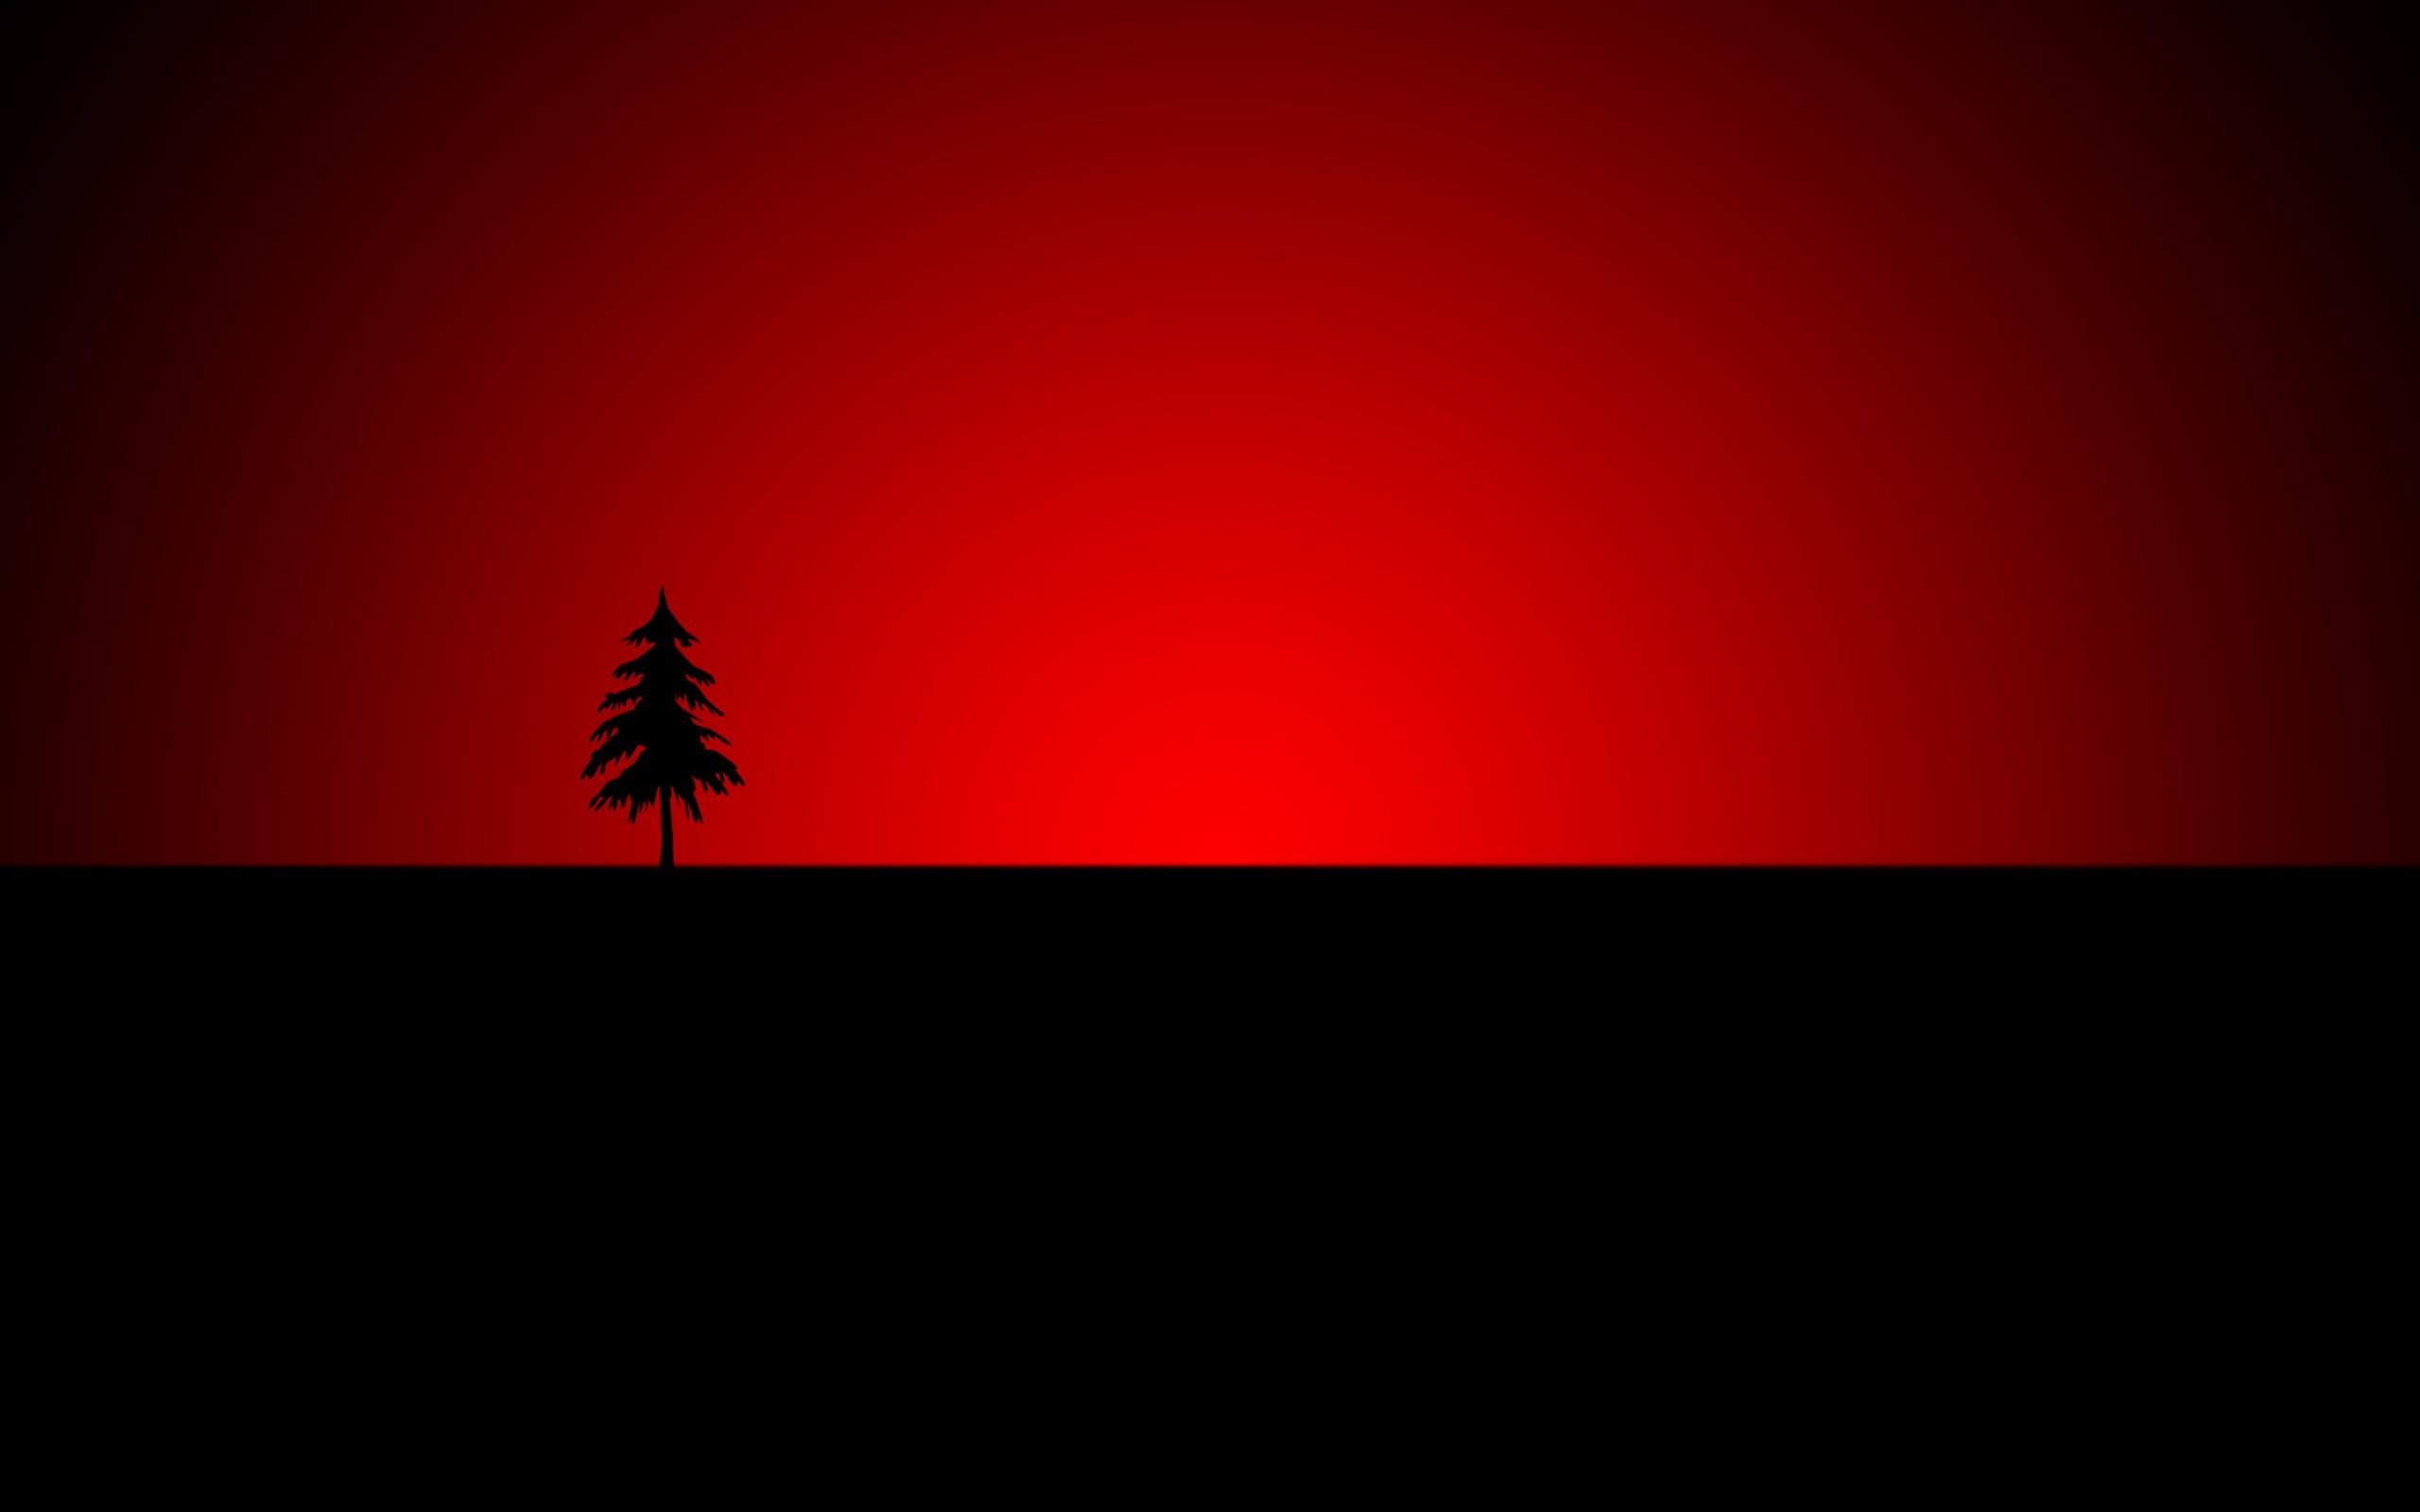 Red wallpaper HD ·① Download free backgrounds for desktop ...